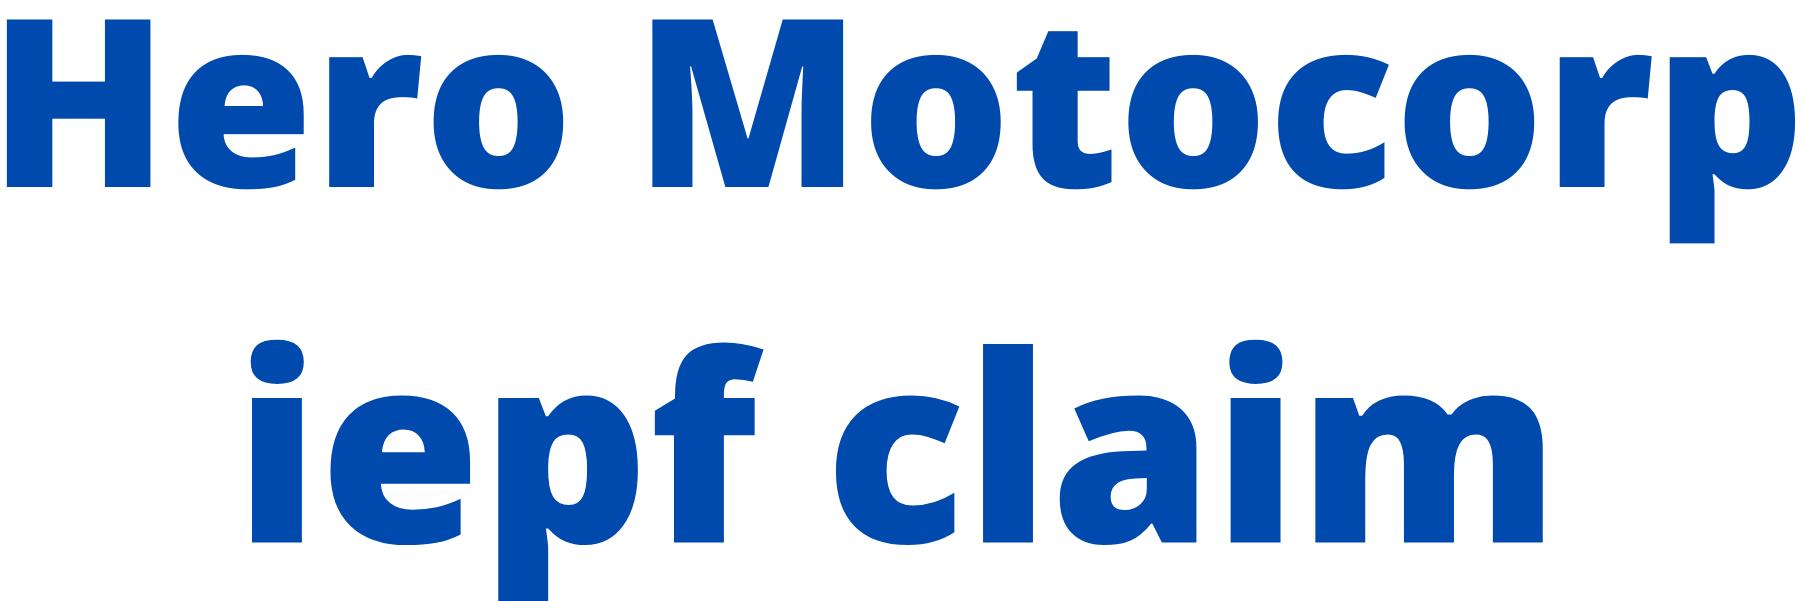 IEPF claim of  HERO MOTOCORP LTD shares / unclaimed dividend of HERO MOTOCORP LTD shares?